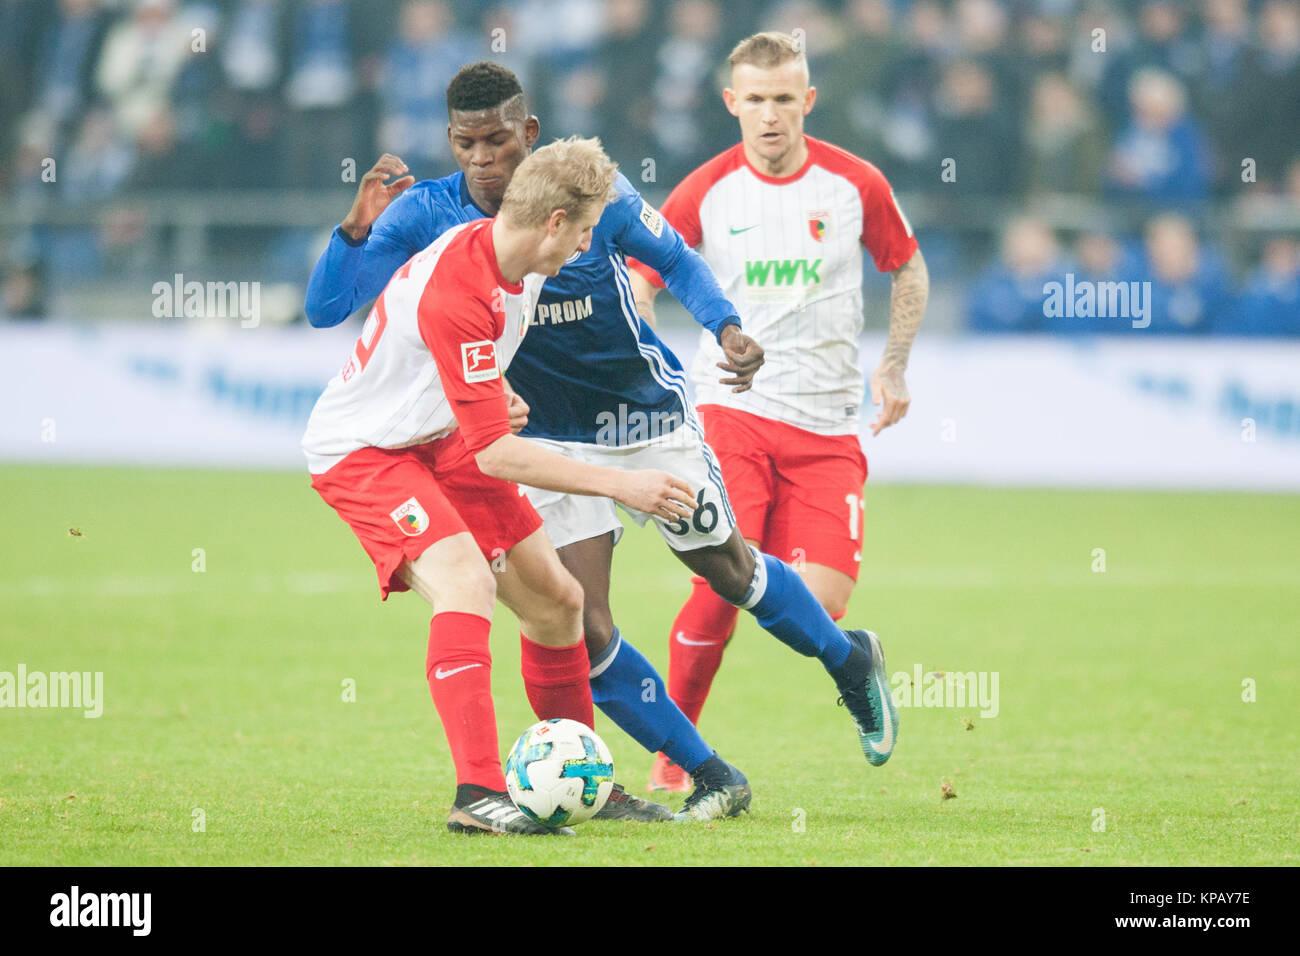 Breel EMBOLO (mi., GE) versus Martin HINTEREGGER (li., A) und Jonathan SCHMID (A), Aktion, Kampf um den Ball, Fussball - Stock Image